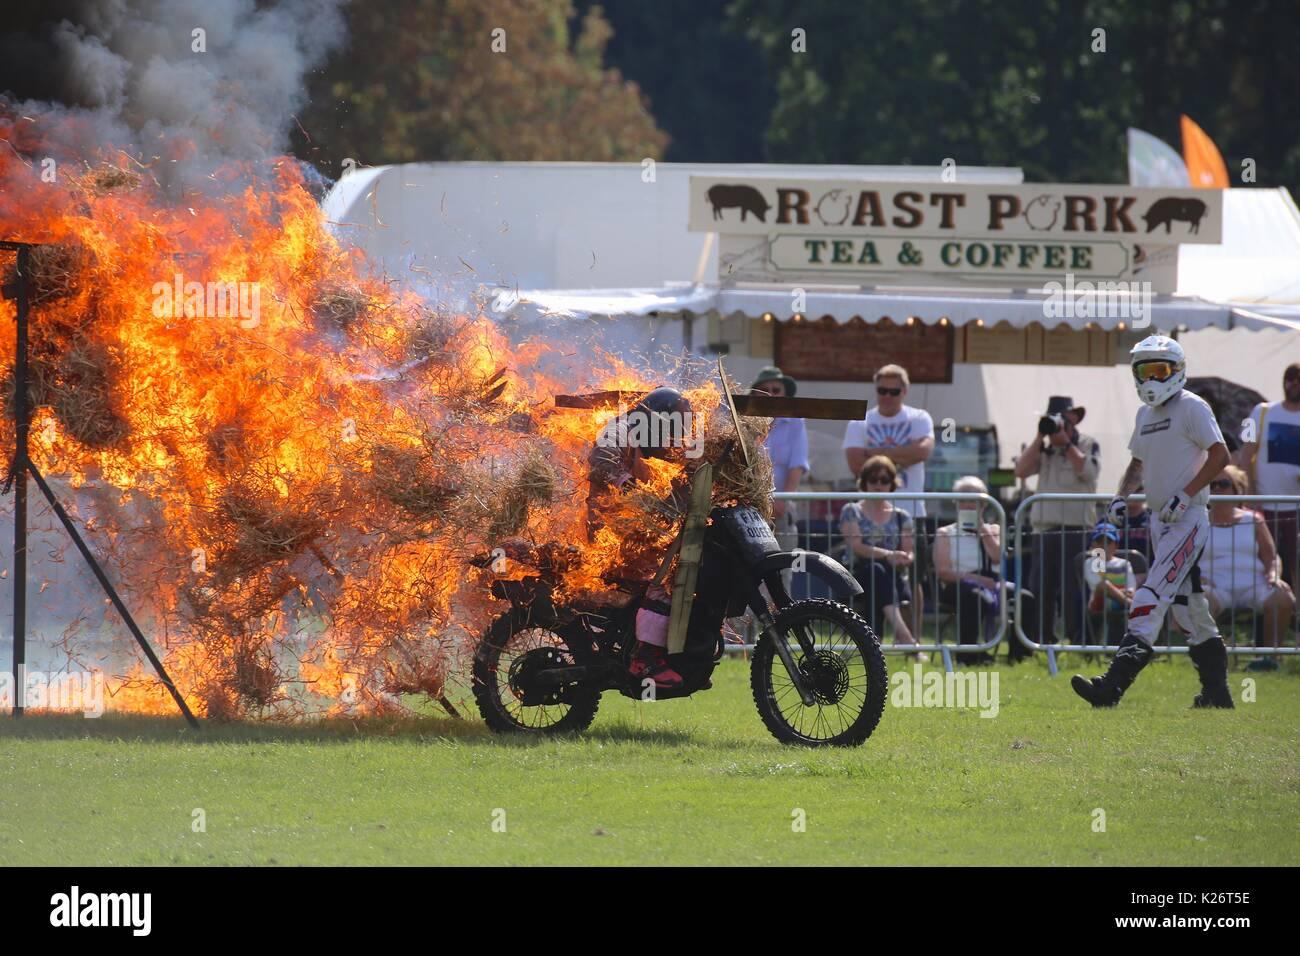 stunt bike on fire - Stock Image